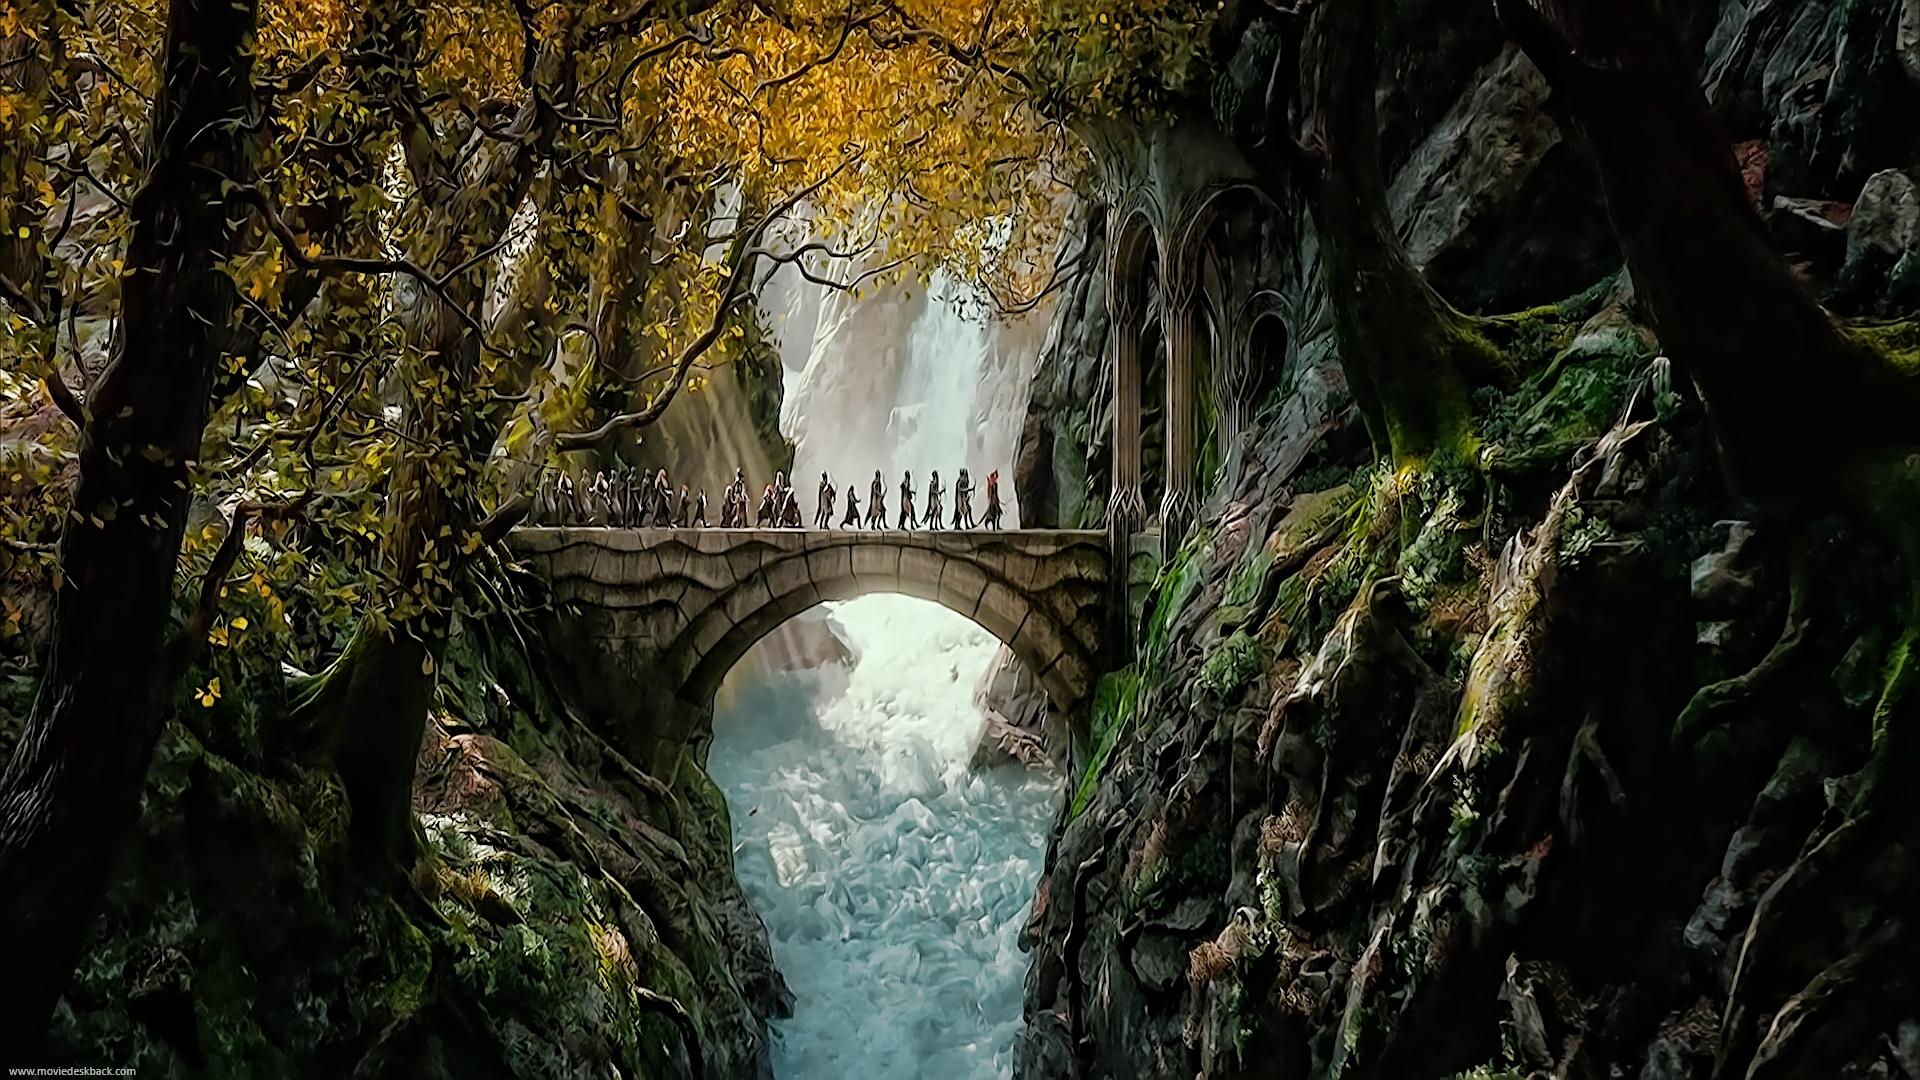 Fantasy Adventure Movie Wallpapers 1920x1080